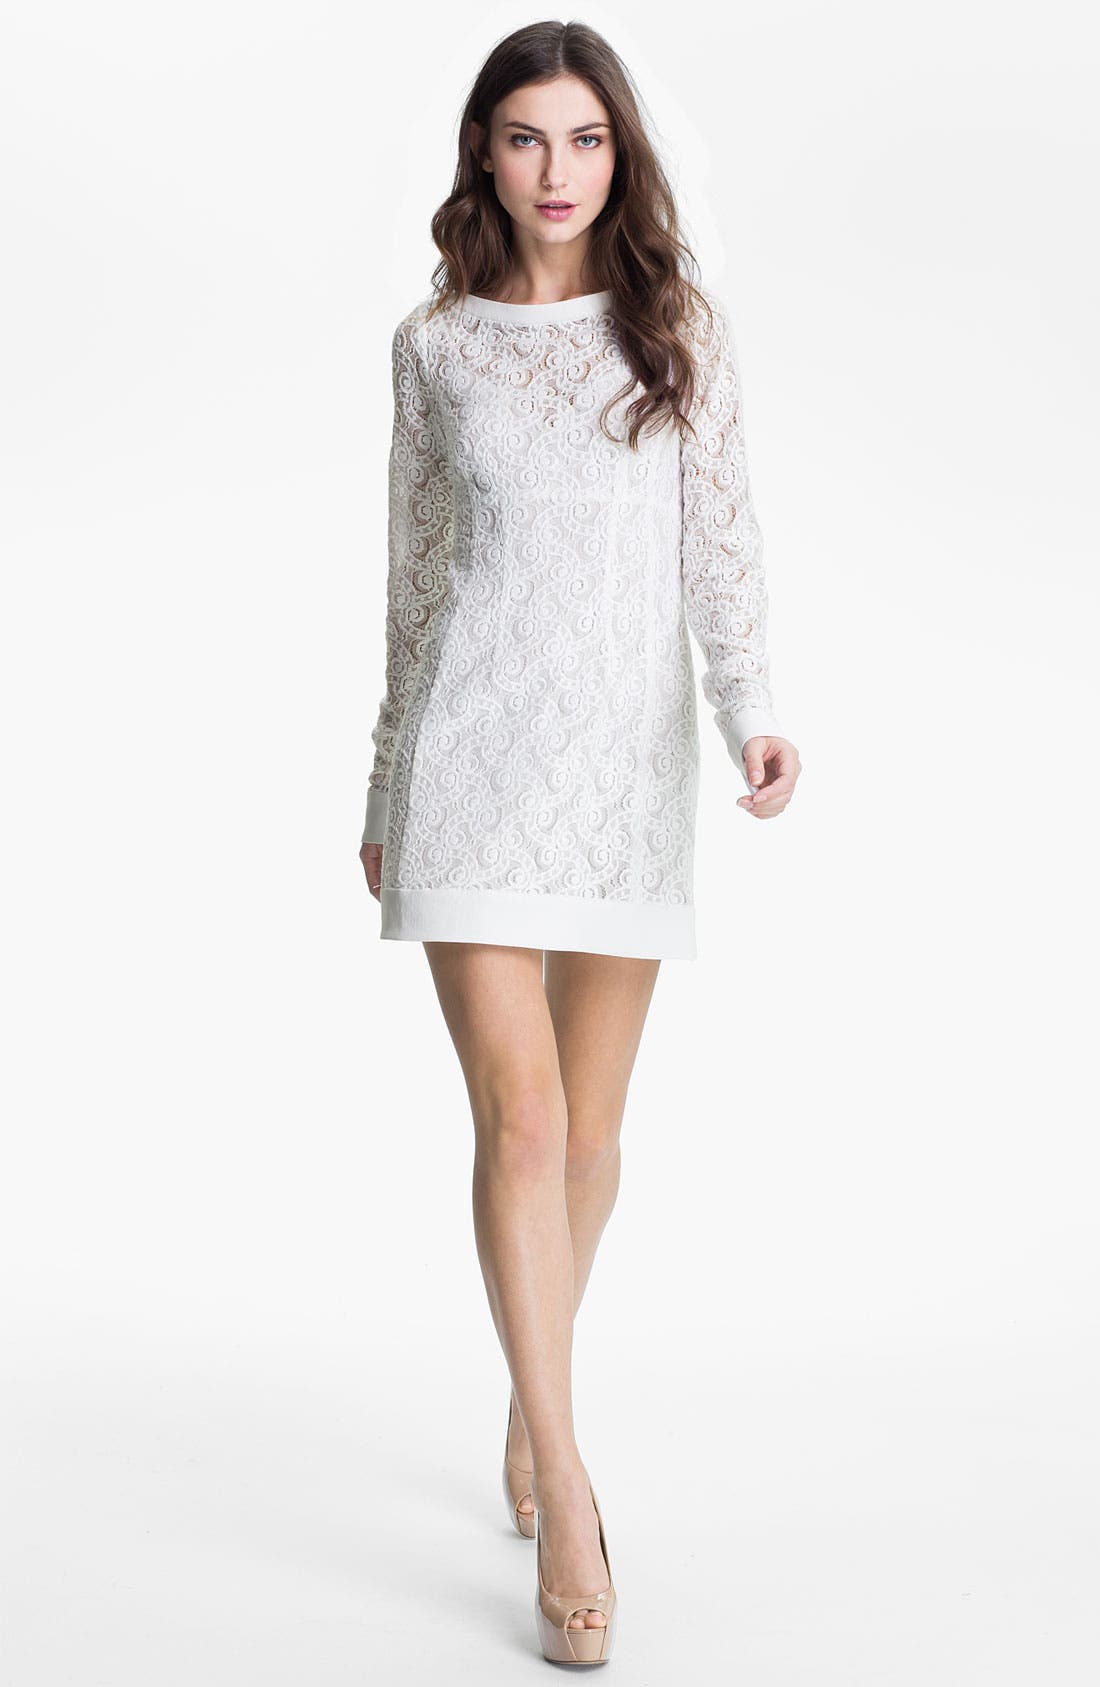 Alternate Image 1 Selected - Nanette Lepore 'Lithograph' Lace Shift Dress